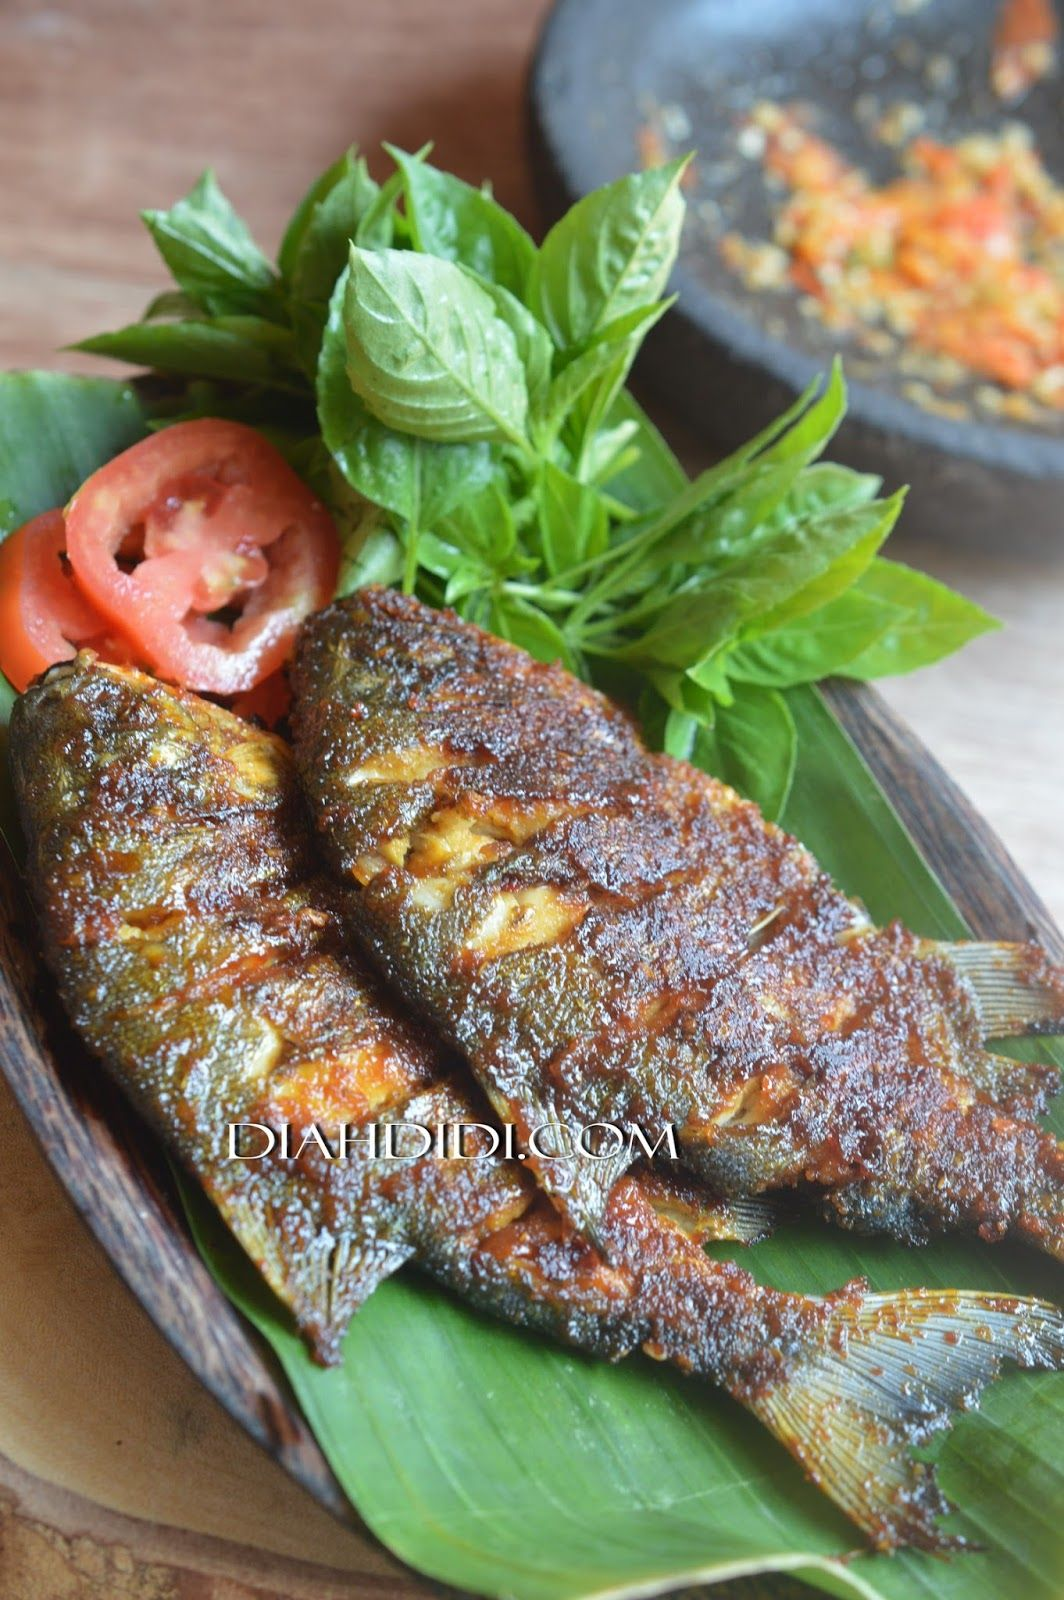 Diah Didi S Kitchen Bawal Bakar Pedas Manis Resep Ikan Bakar Makanan Ikan Makanan Dan Minuman